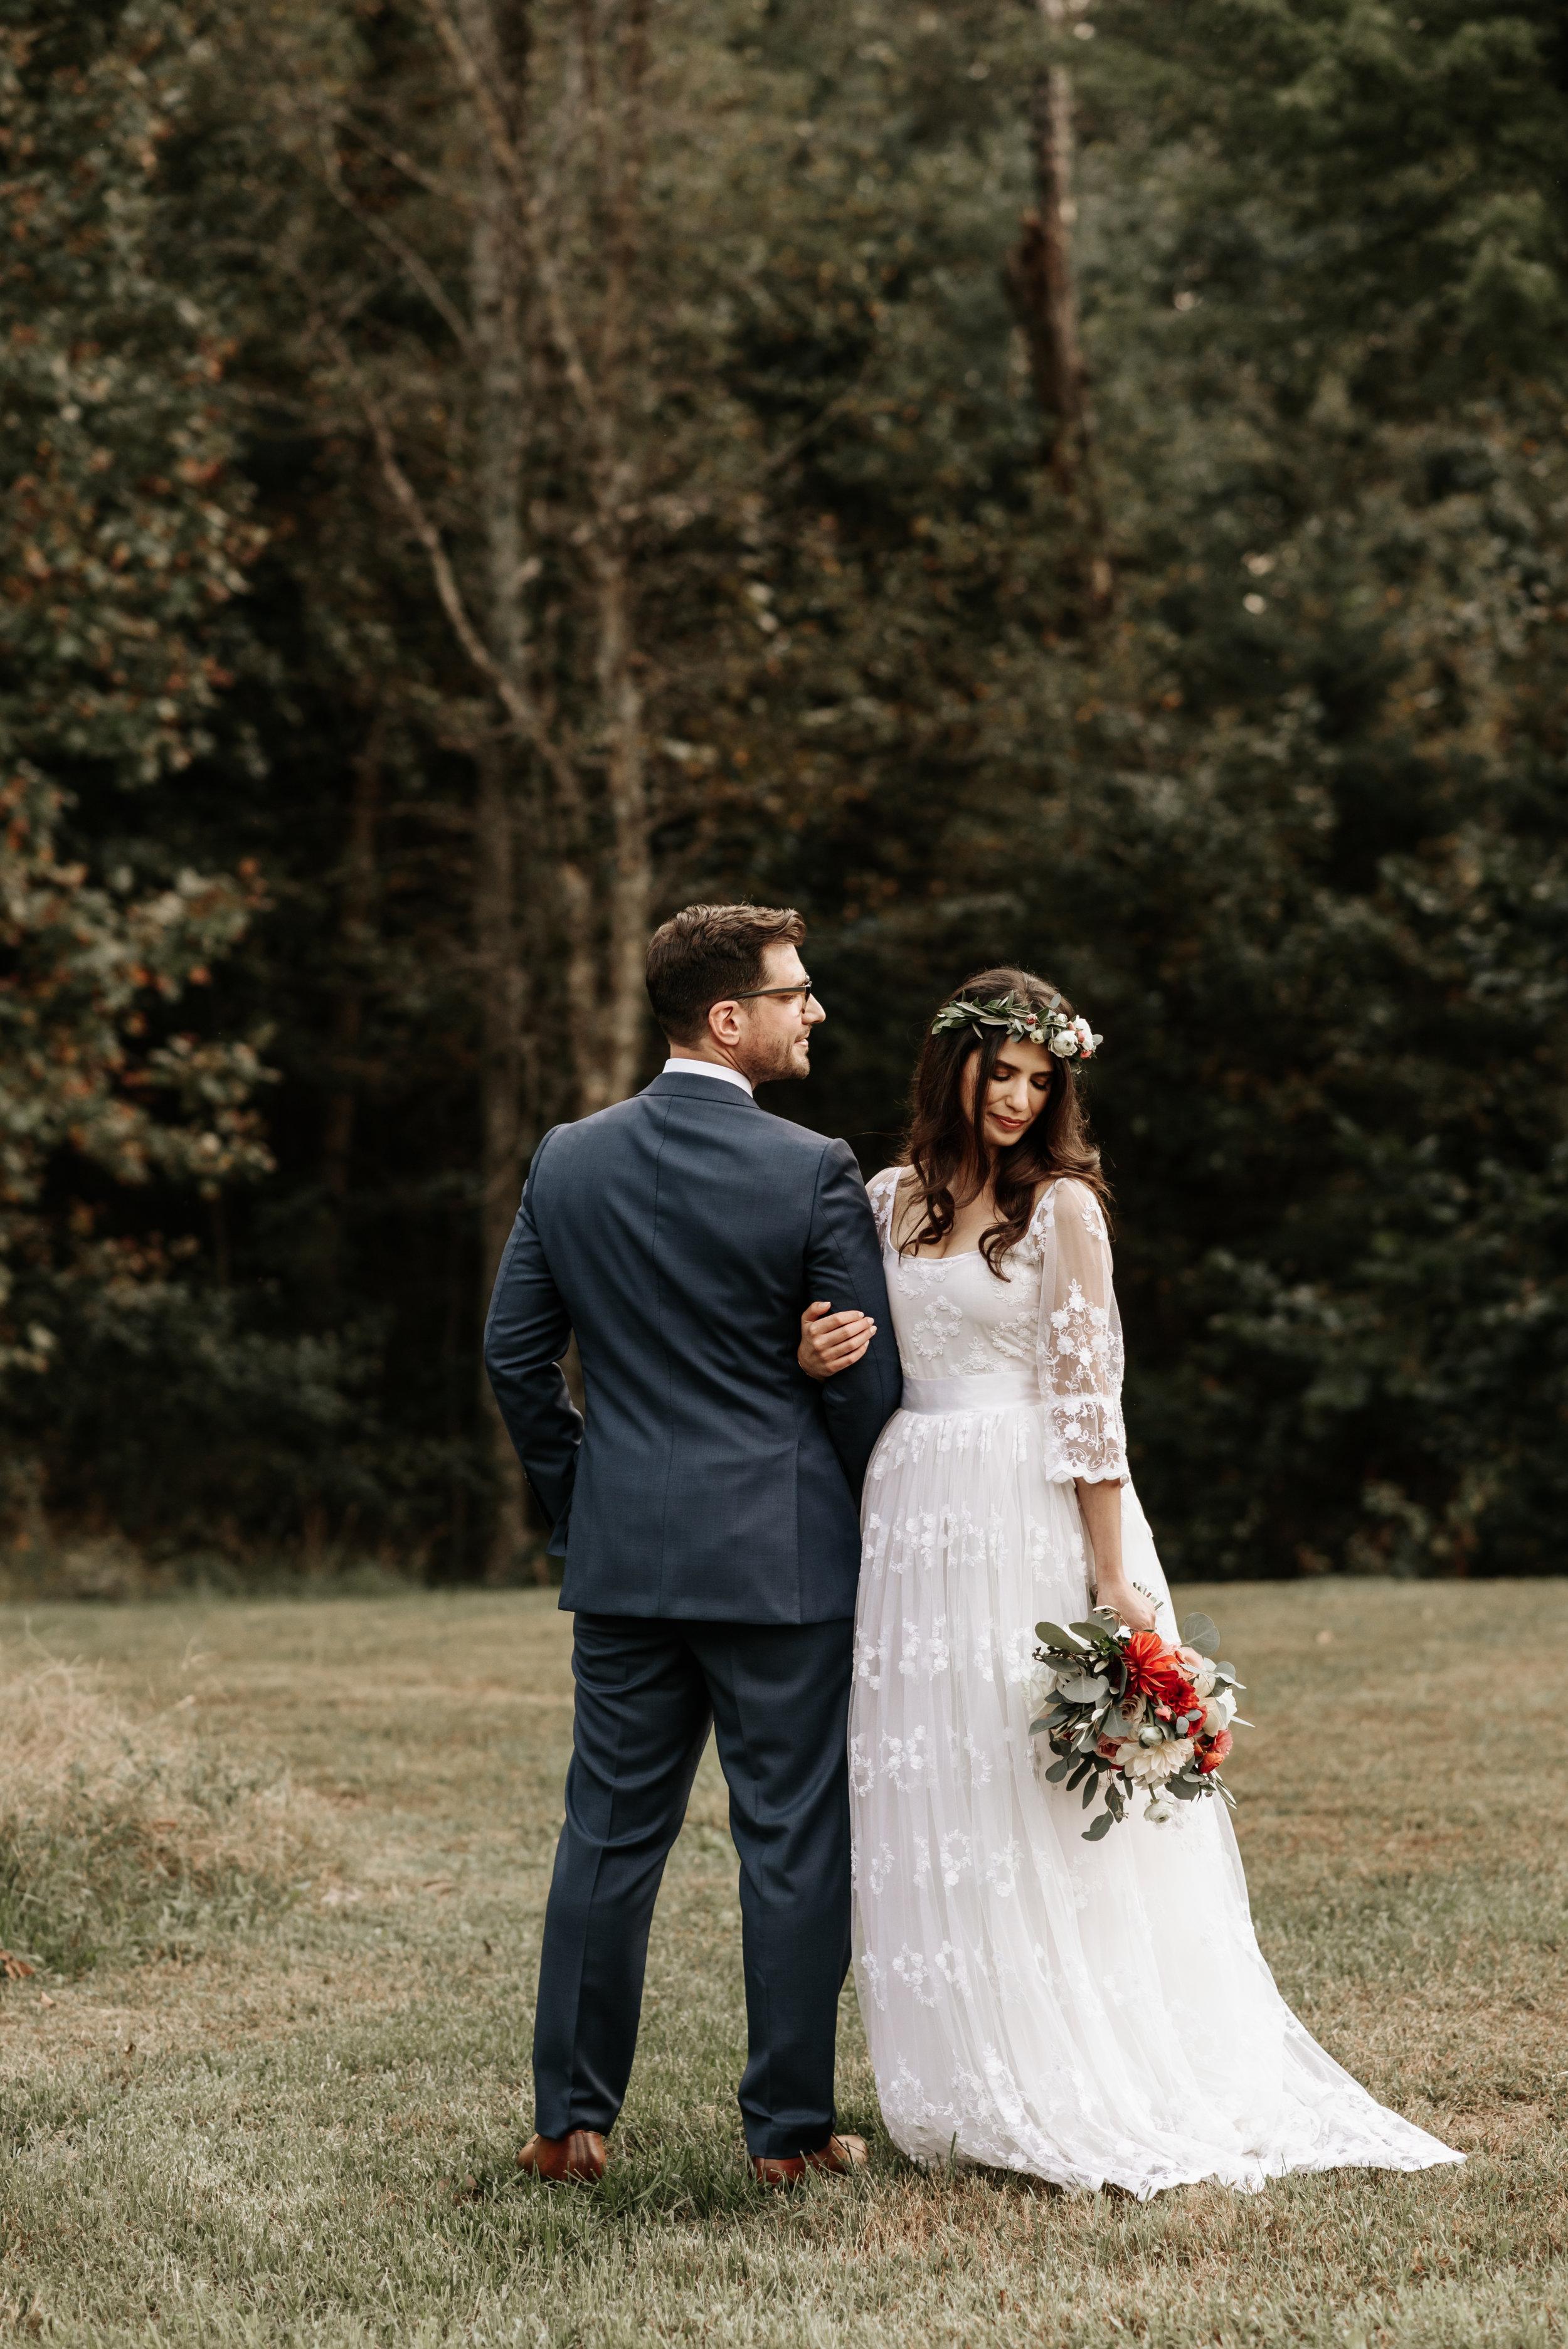 Veritas-Vineyards-and-Winery-Wedding-Photography-Afton-Virginia-Yasmin-Seth-Photography-by-V-2338.jpg